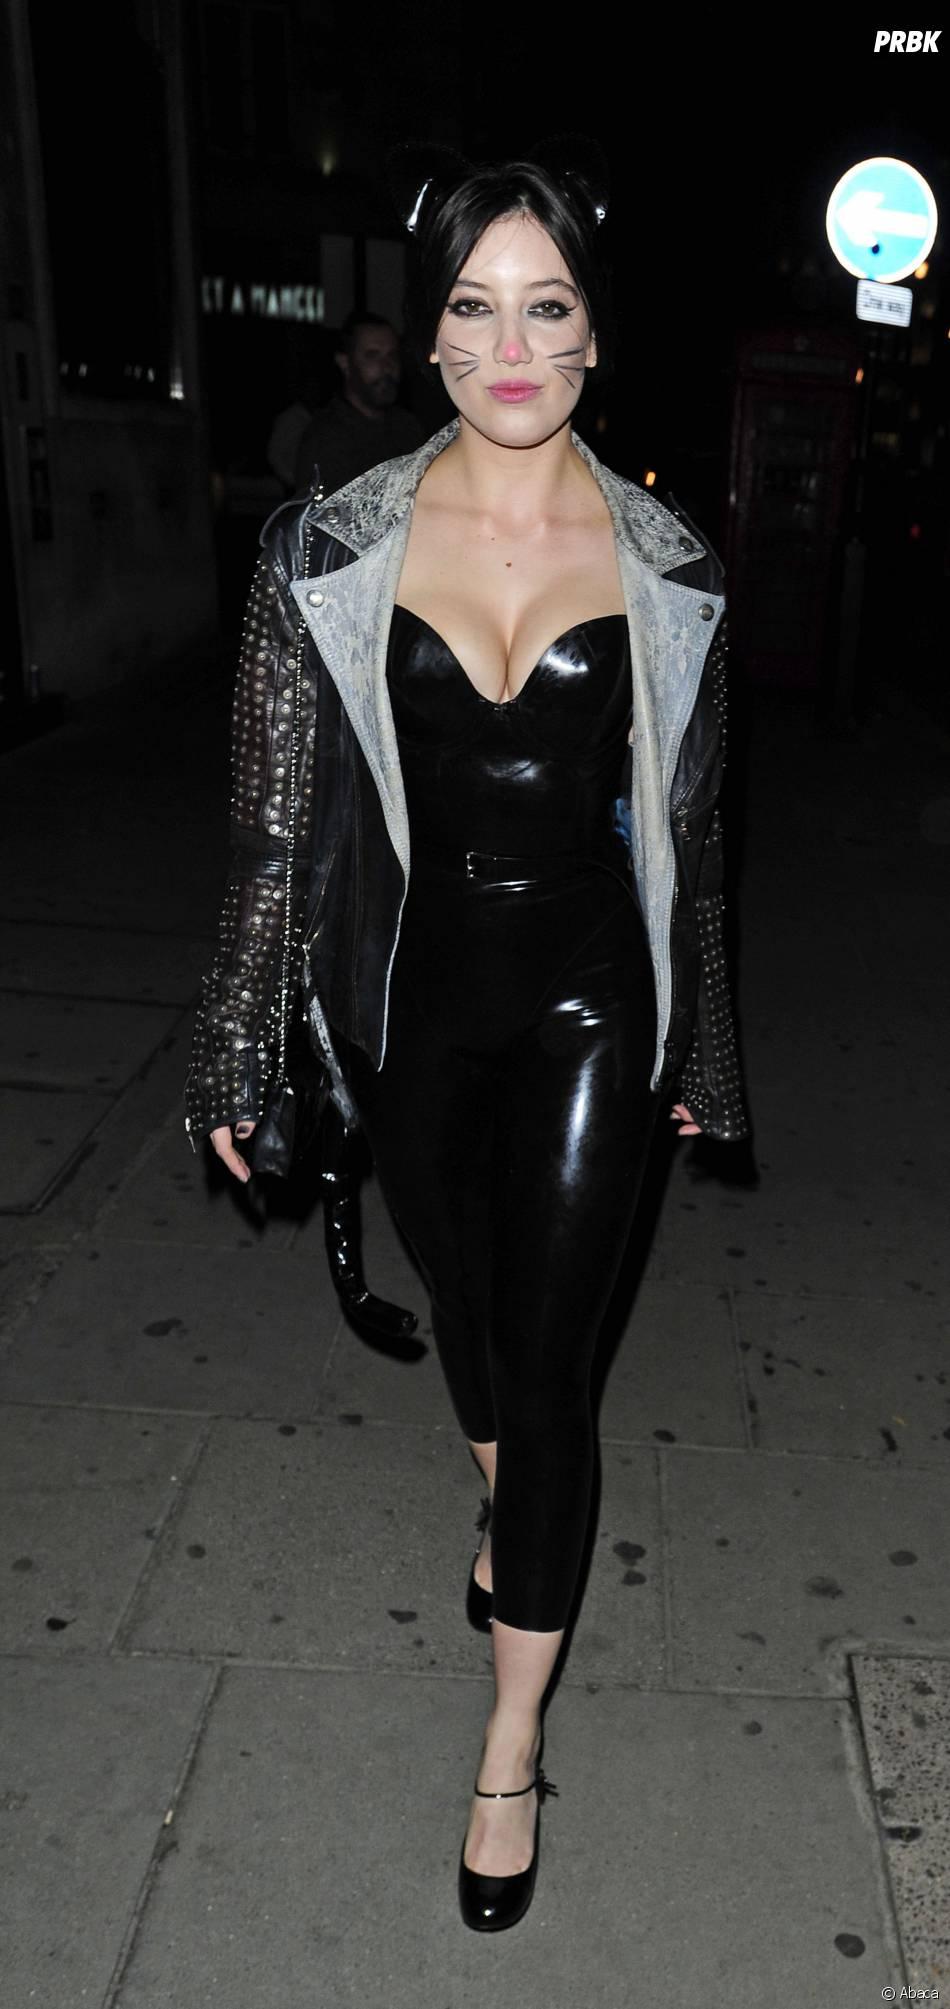 Daisy Lowe en Catwoman hot pour Halloween 2014